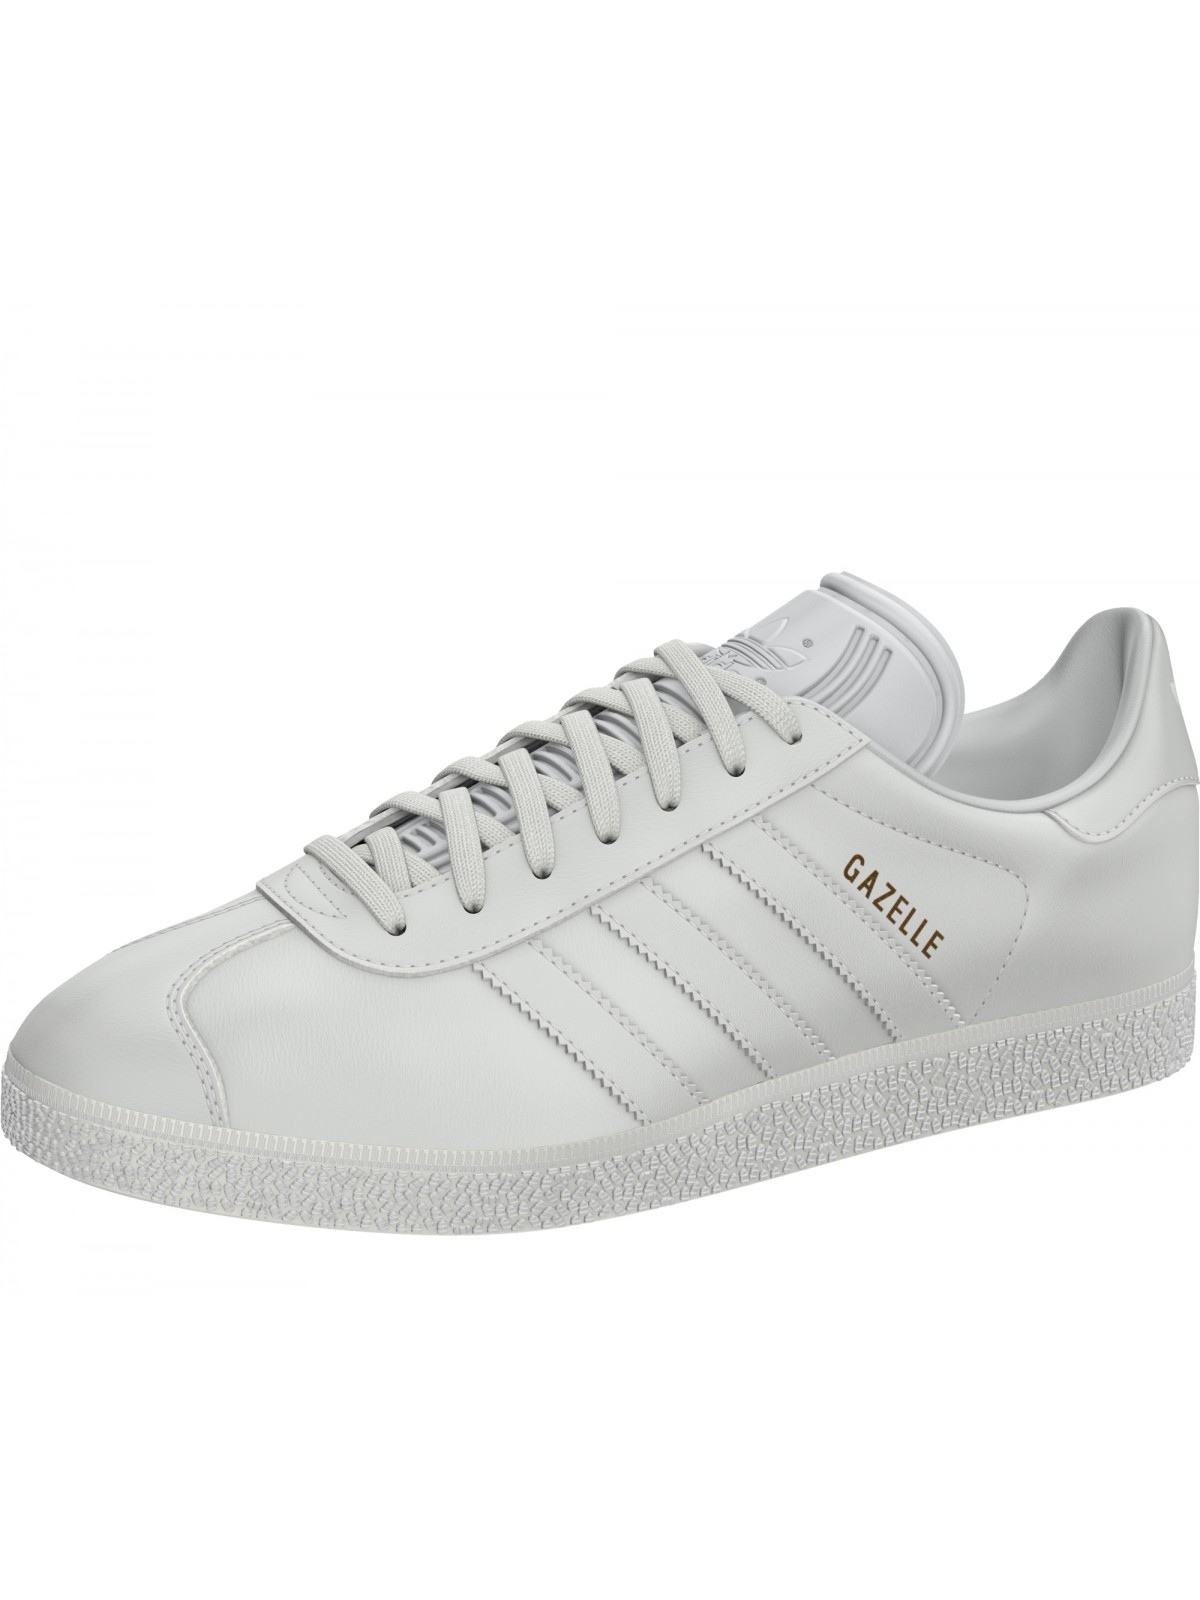 Acheter adidas gazelle cuir blanc pas cher